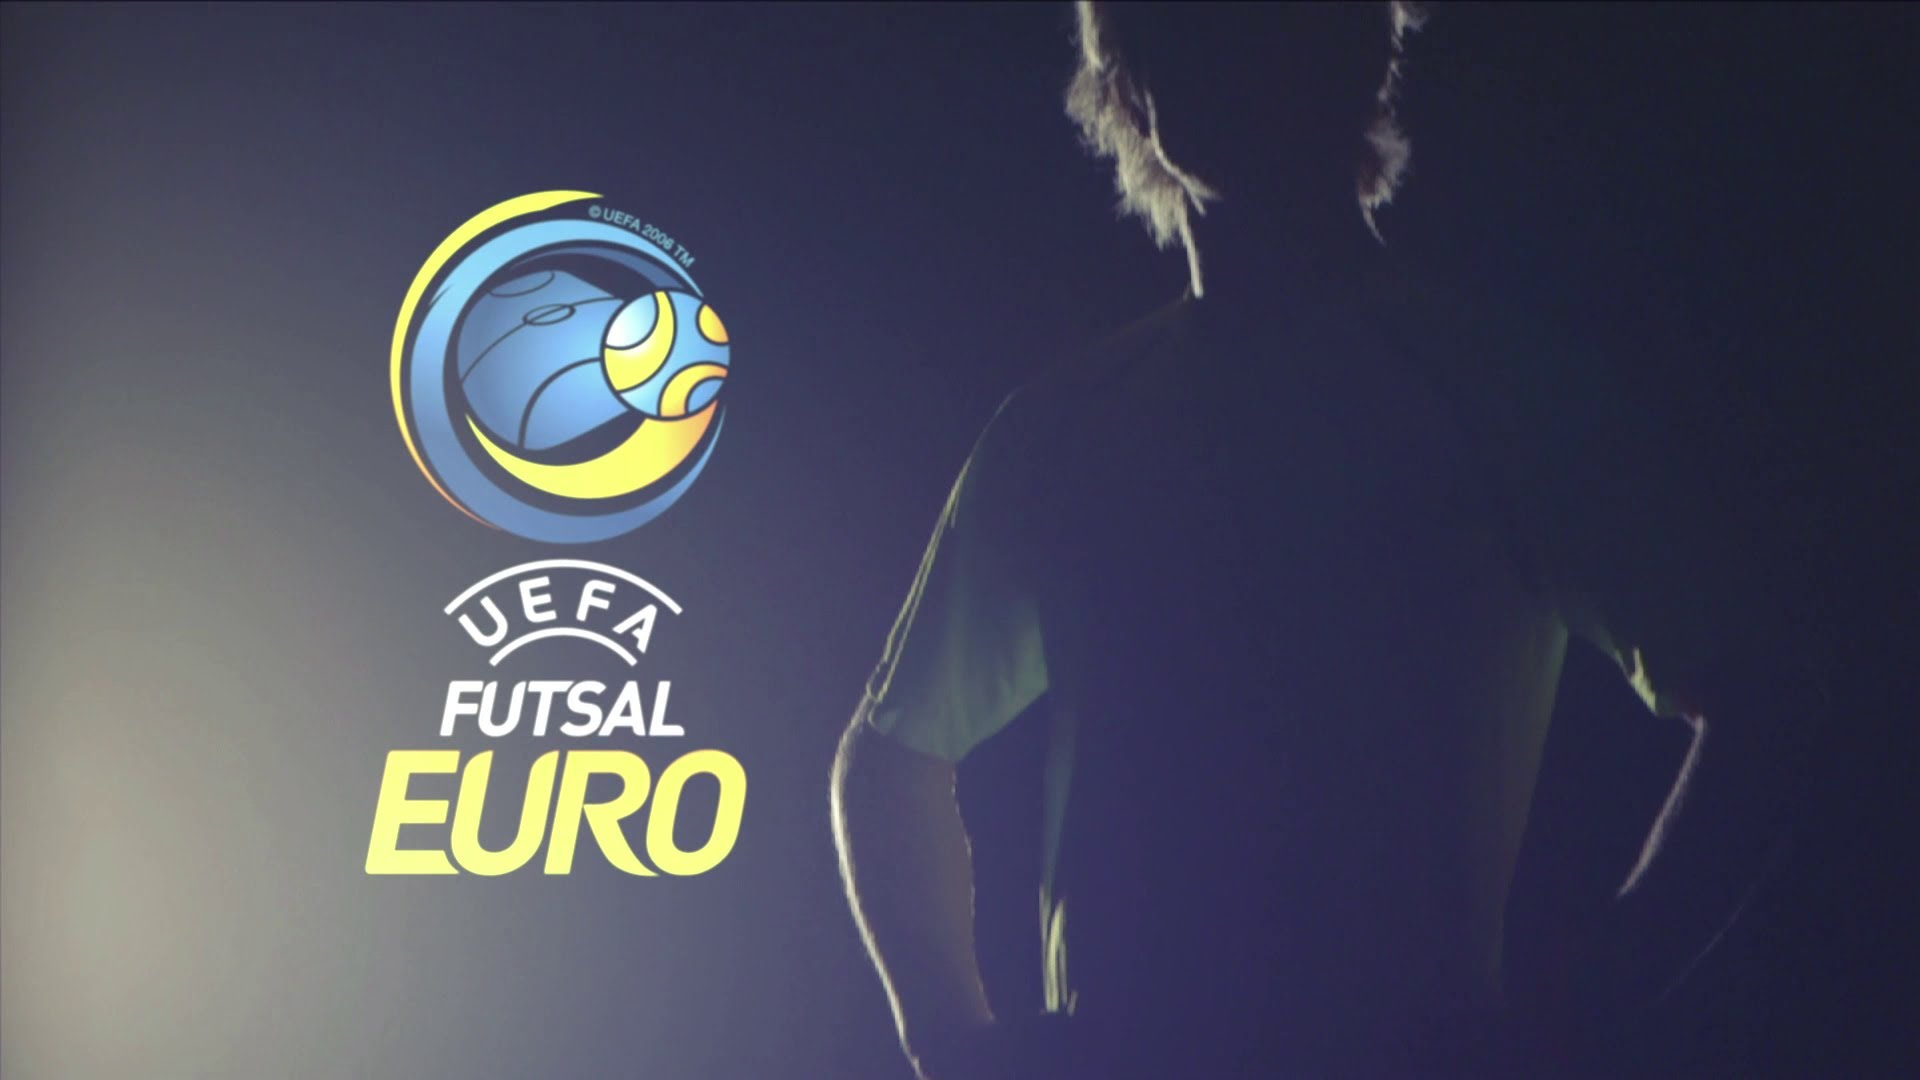 Futsal - L'UEFA organisera un Euro futsal à partir de 2019